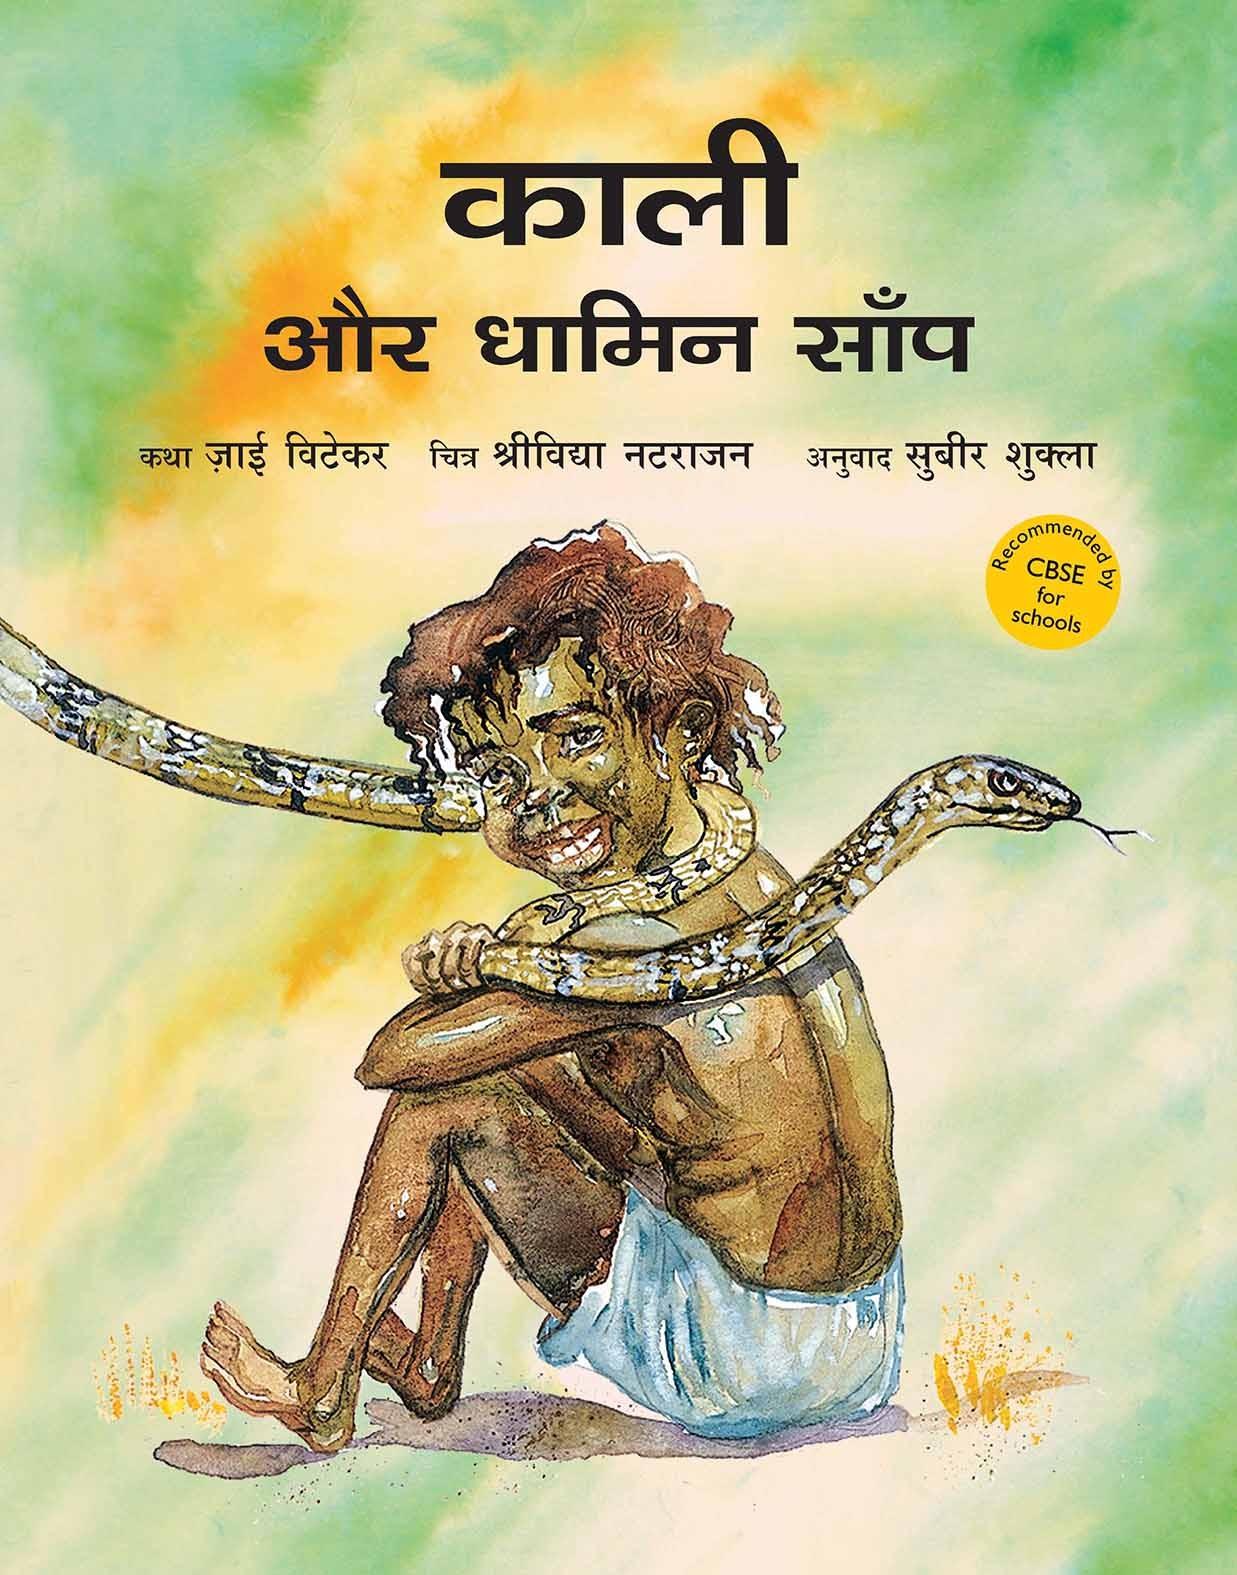 Kali And The Rat Snake/Kali Aur Dhamin Saamp (Hindi)